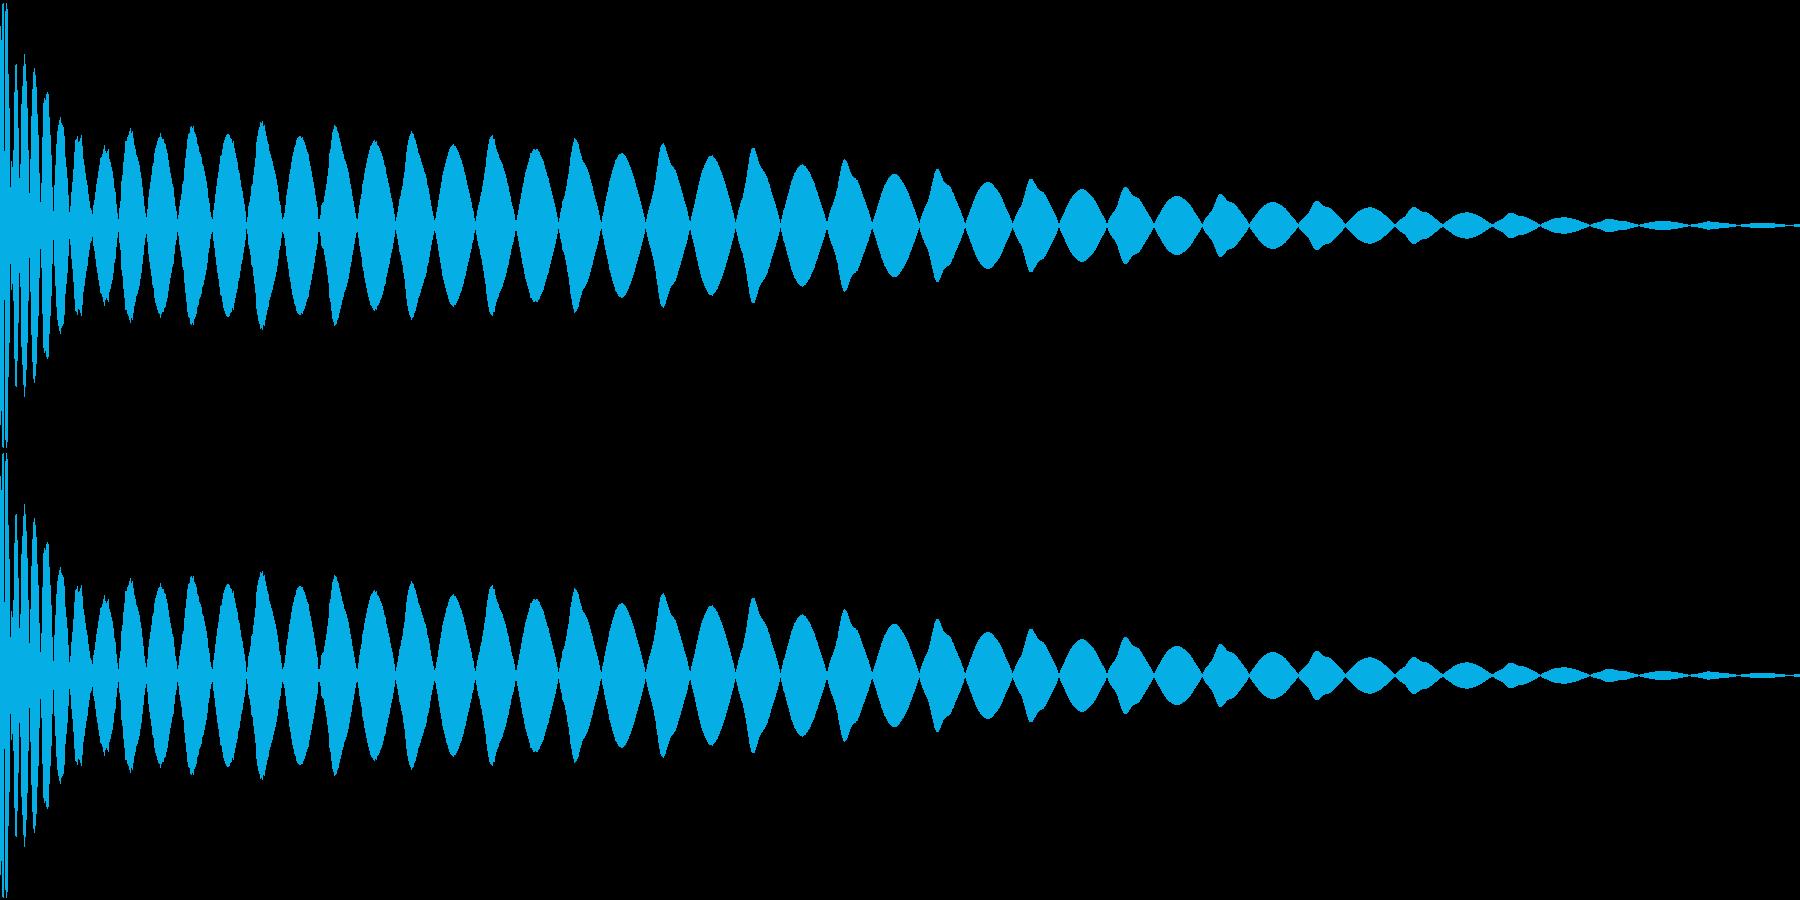 DTM Kick 91 オリジナル音源の再生済みの波形